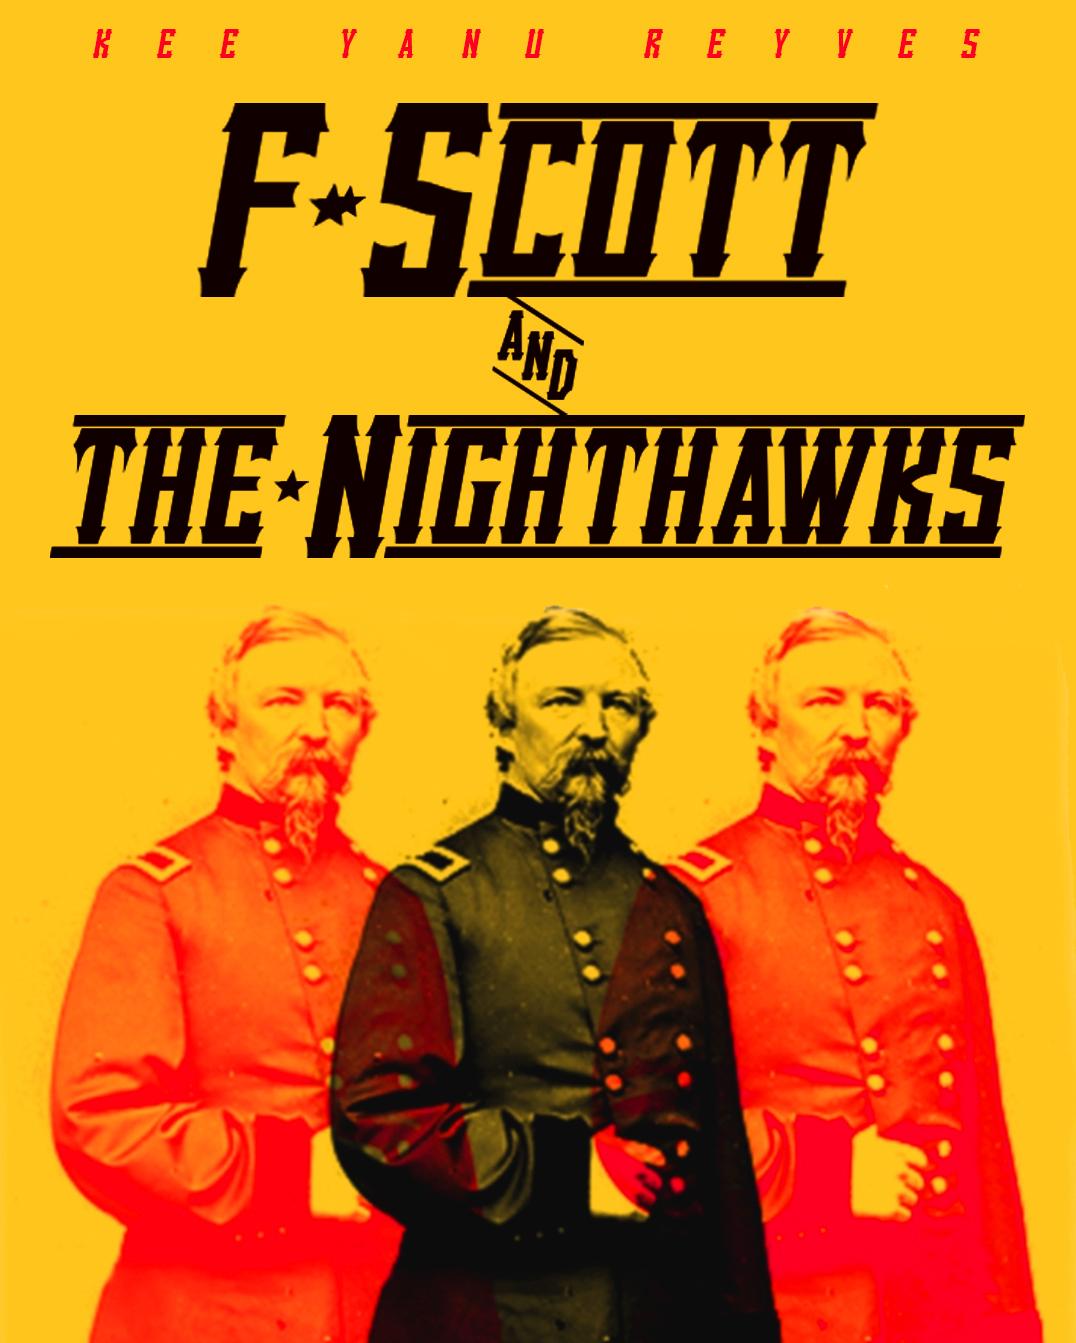 F-SCOTT-NIGHTHAWKS-poster1.jpg